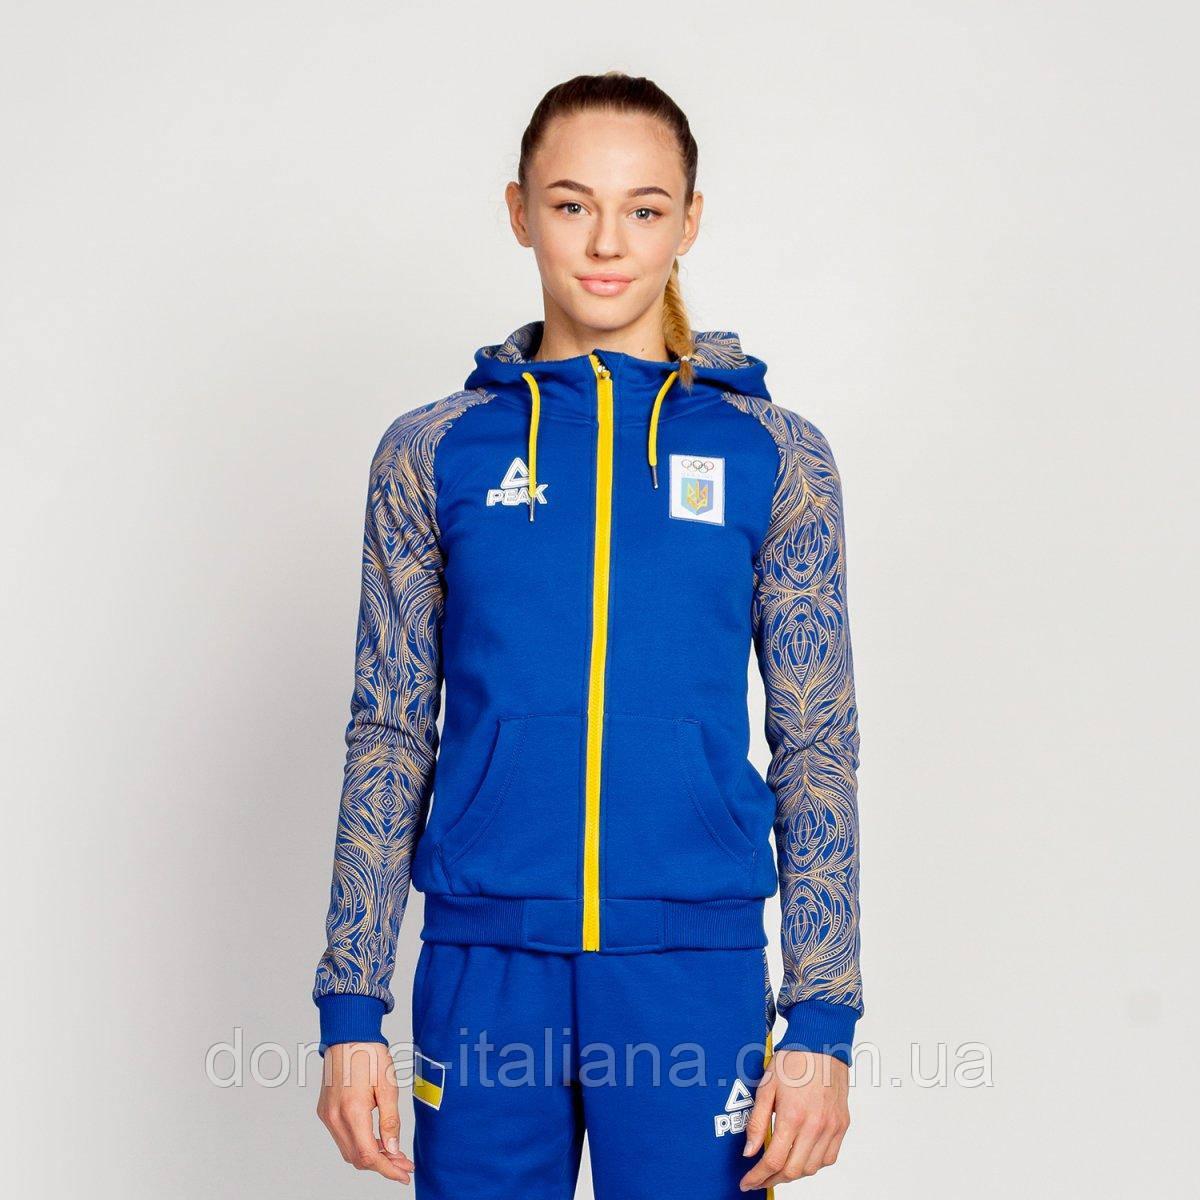 Спортивная кофта Peak Sport FS-UW1816NOK-BLU утепленная XL Синяя (6941123671606)